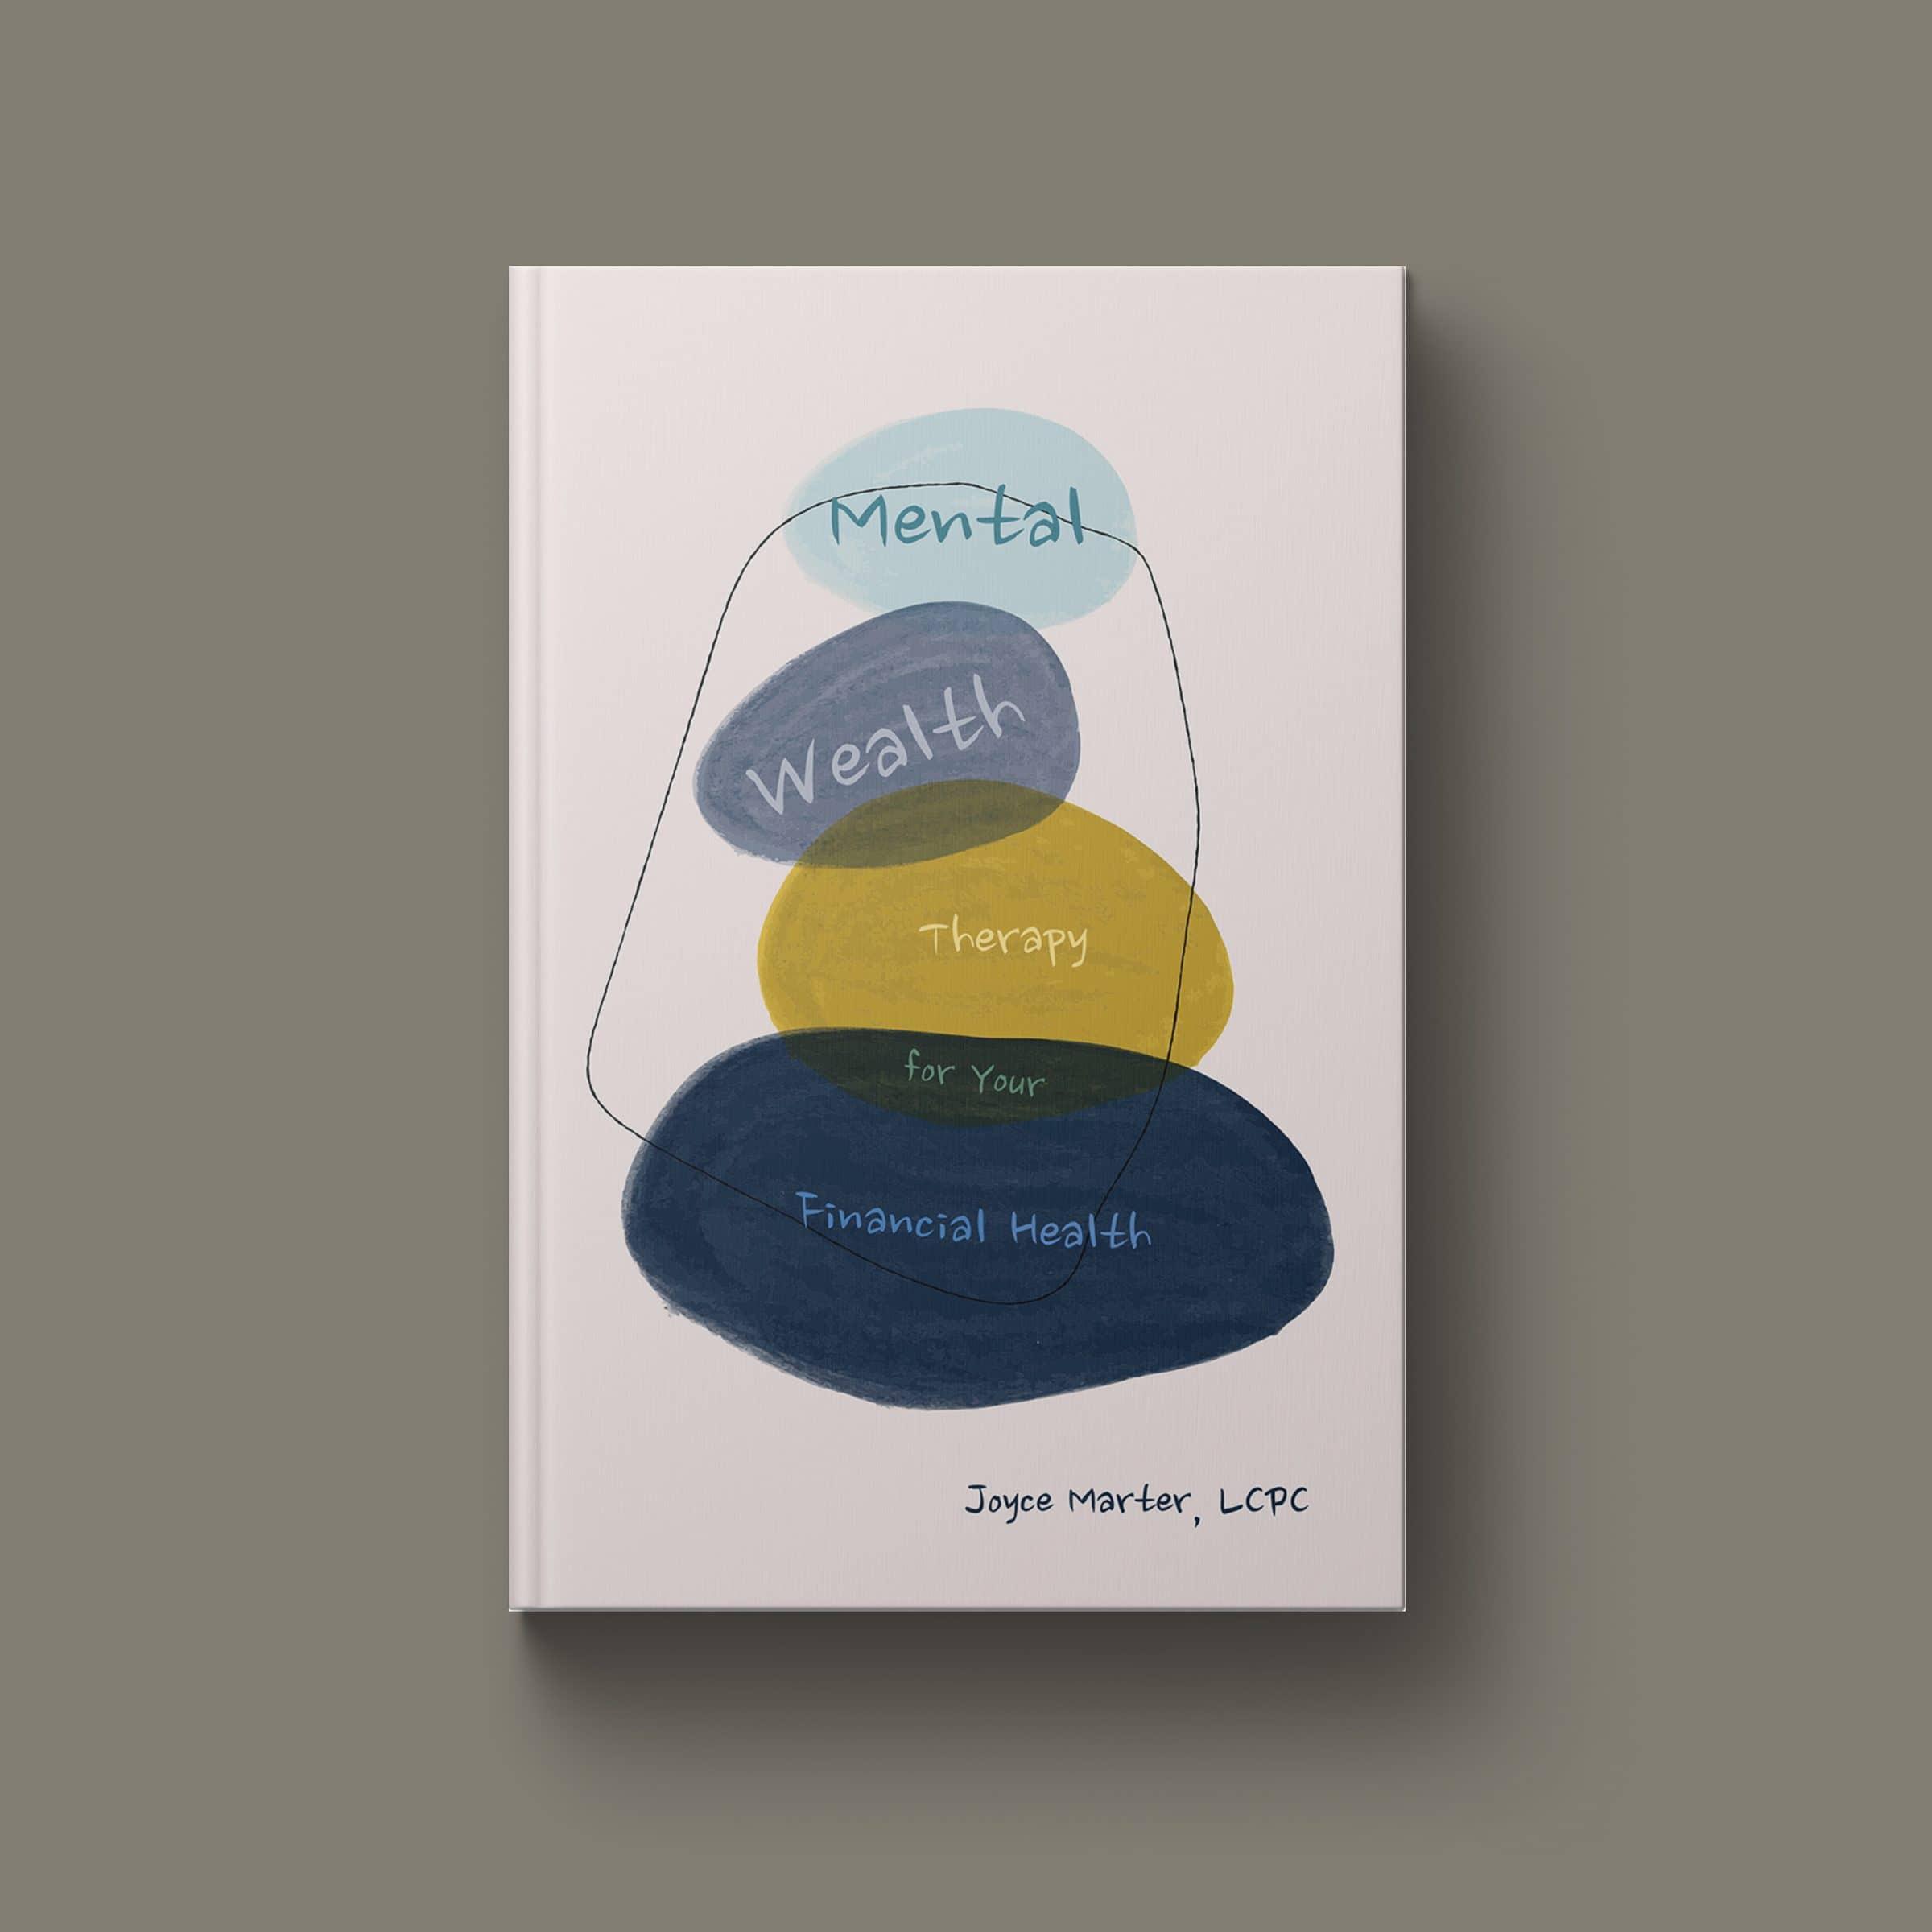 mental-wealth-joyce-marter-cover-art-7